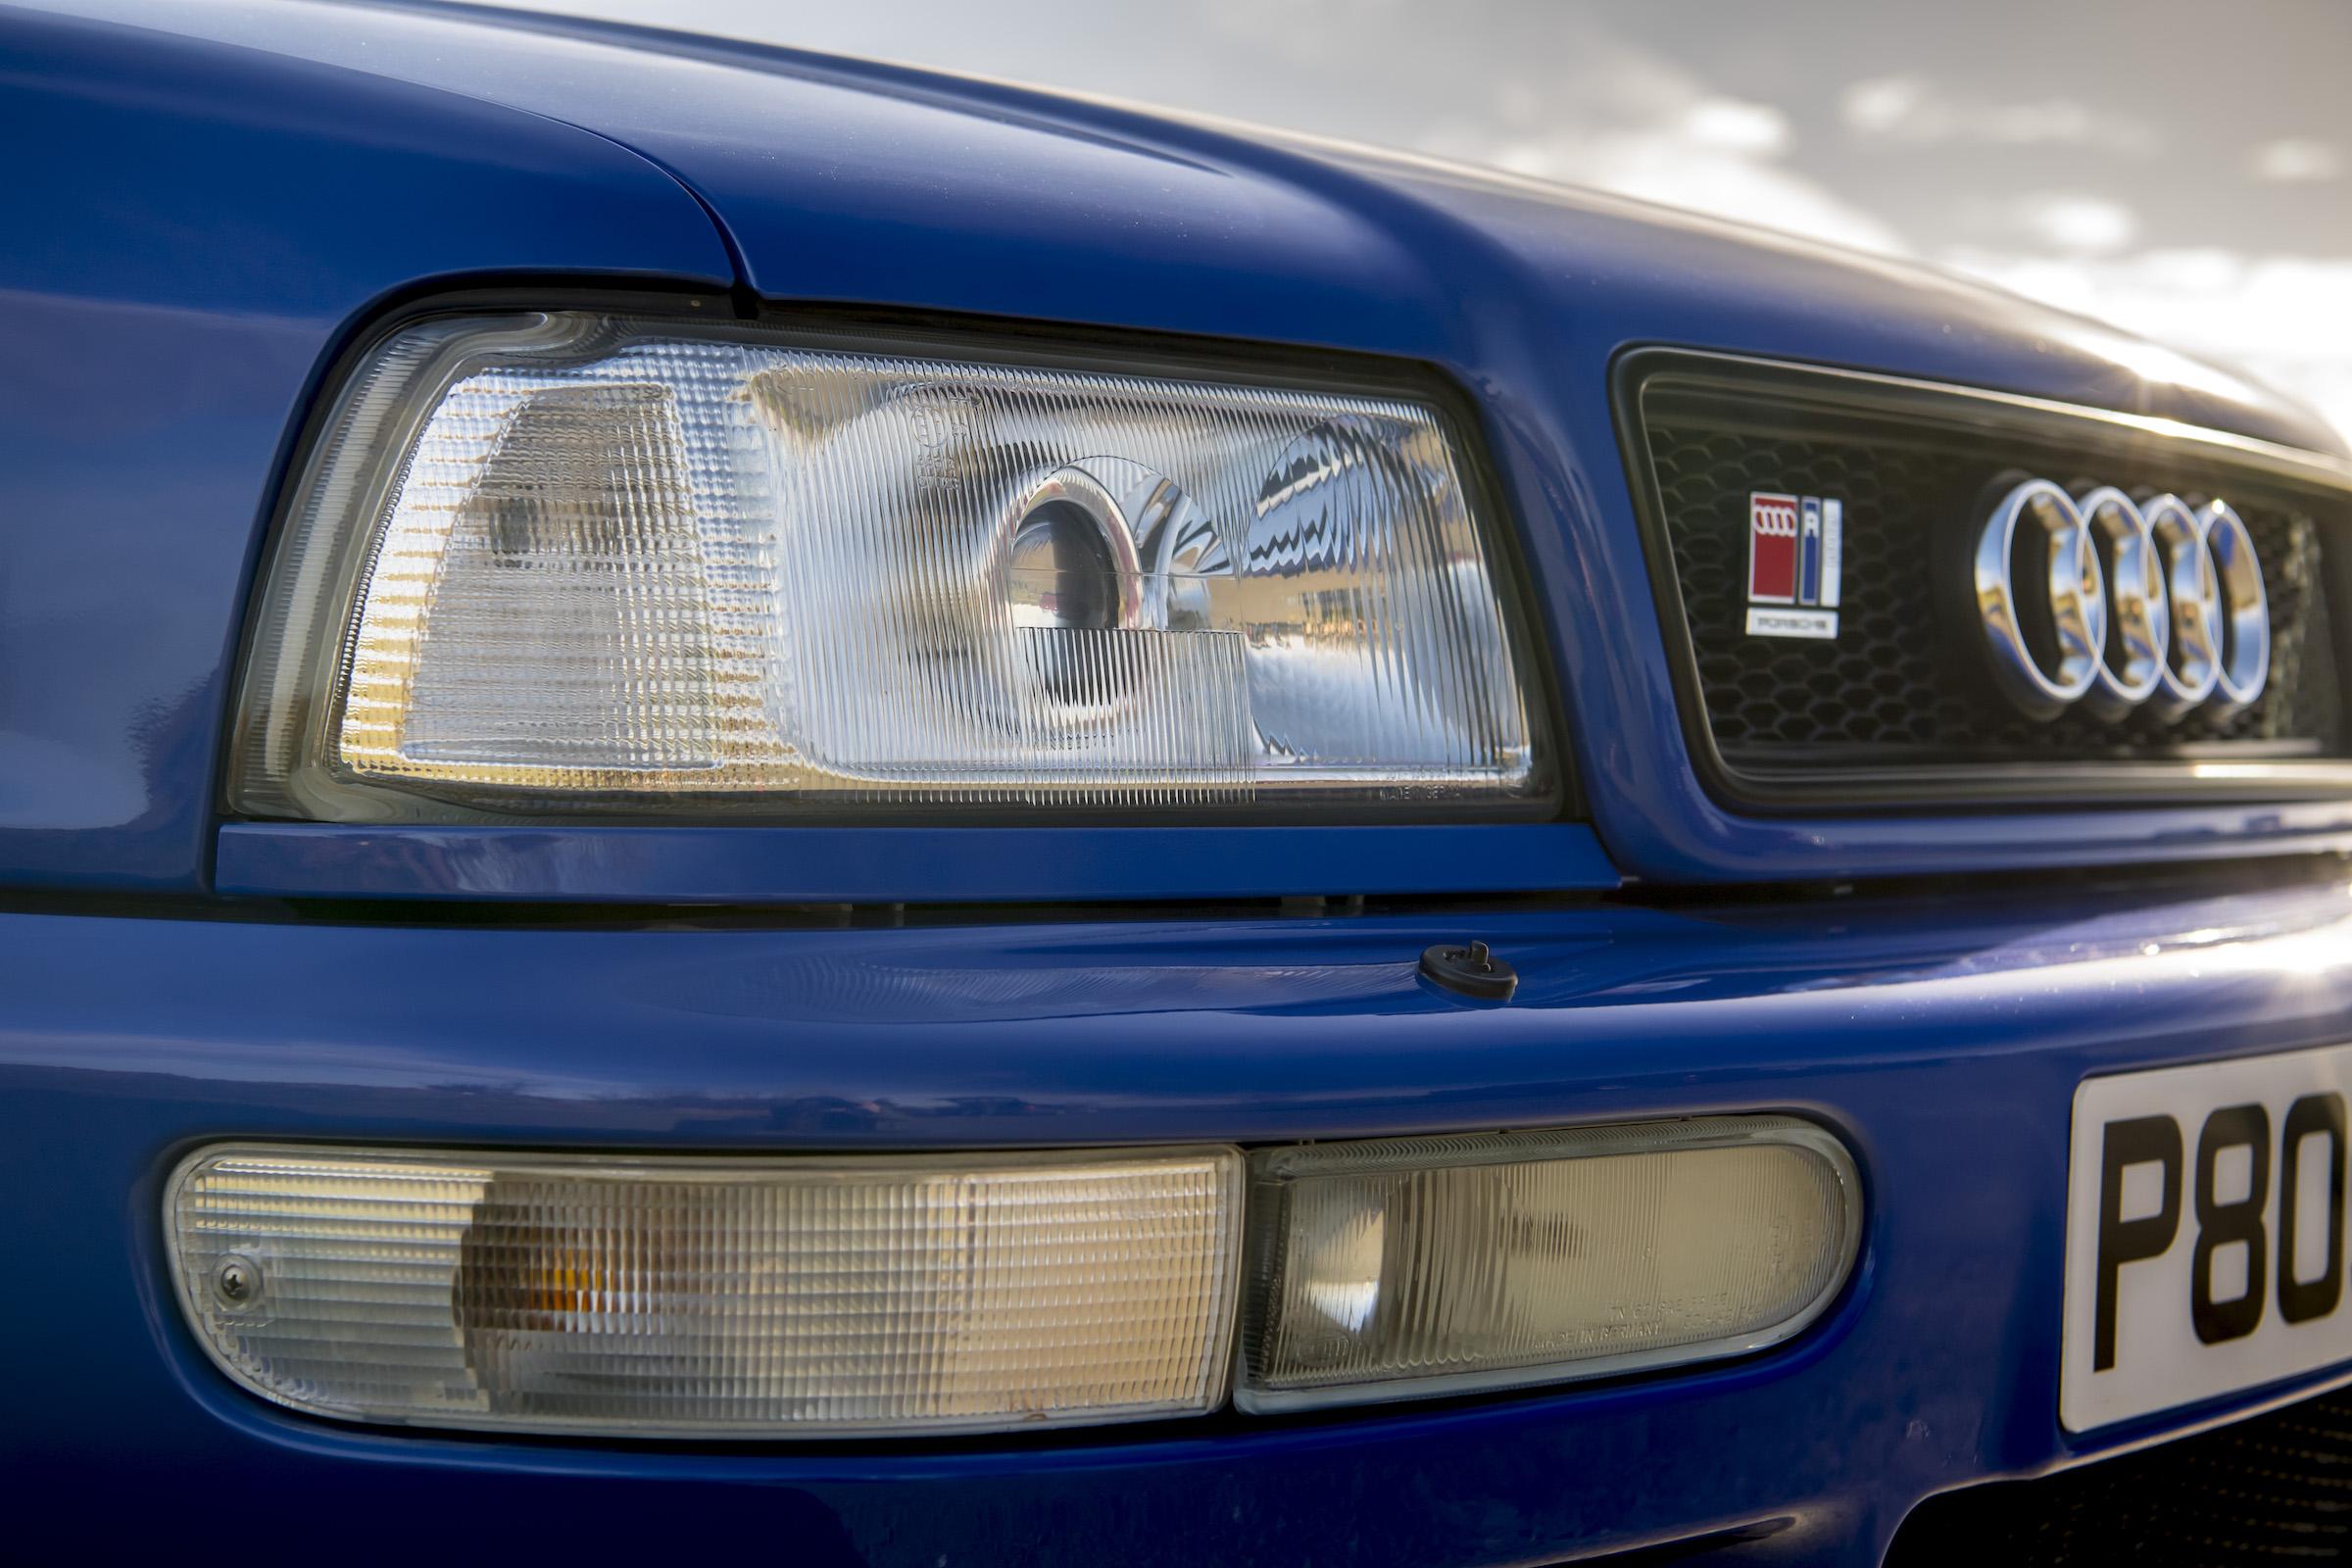 Audi RS2 front headlight